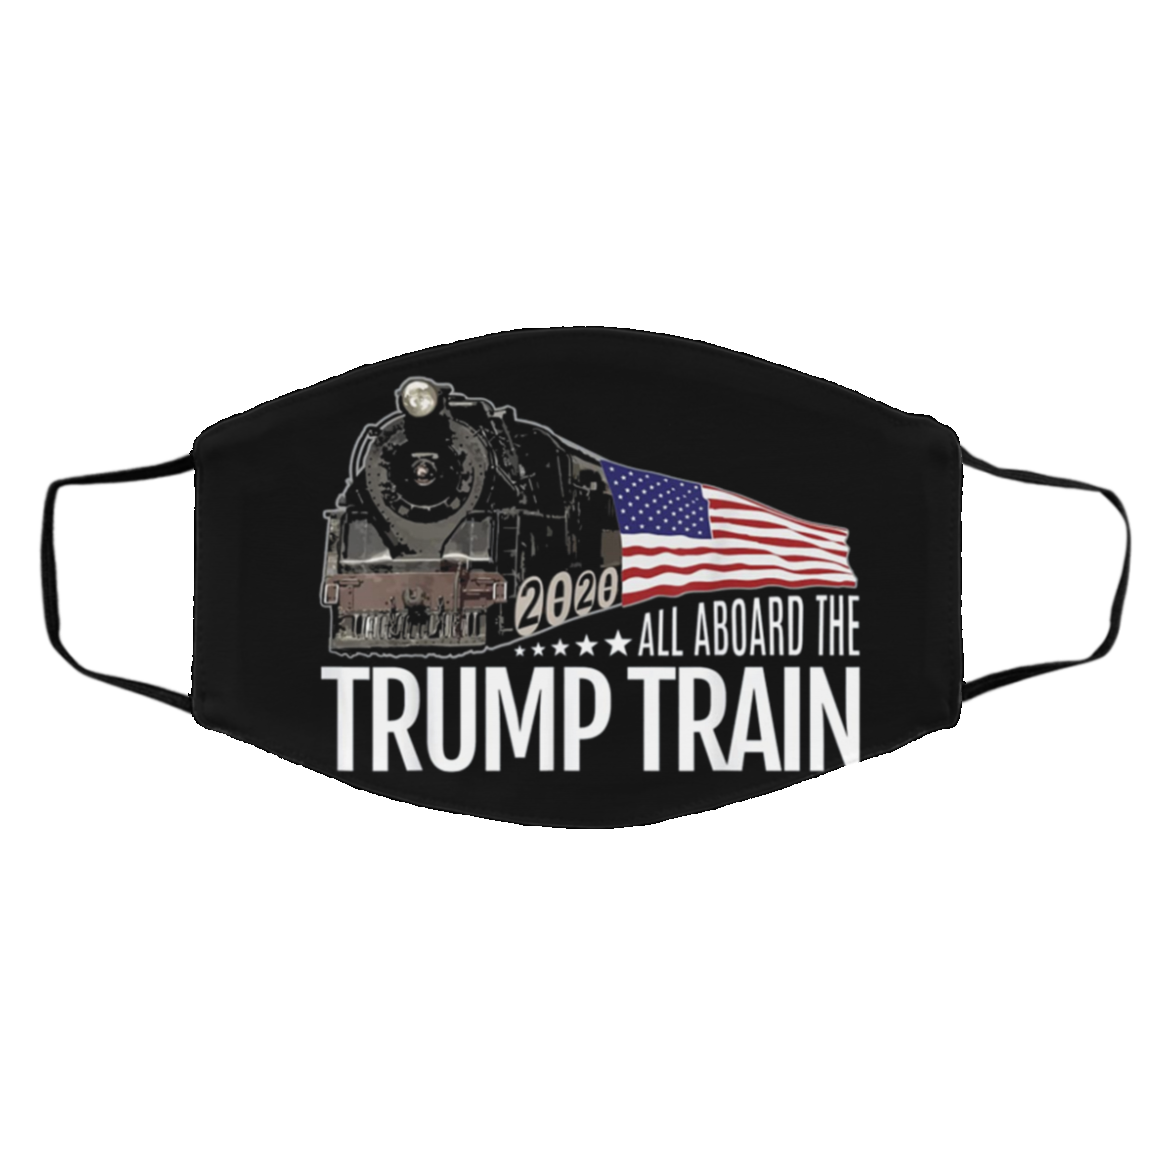 ALL ABOARD THE TRUMP TRAIN 2020 FACE MASKS